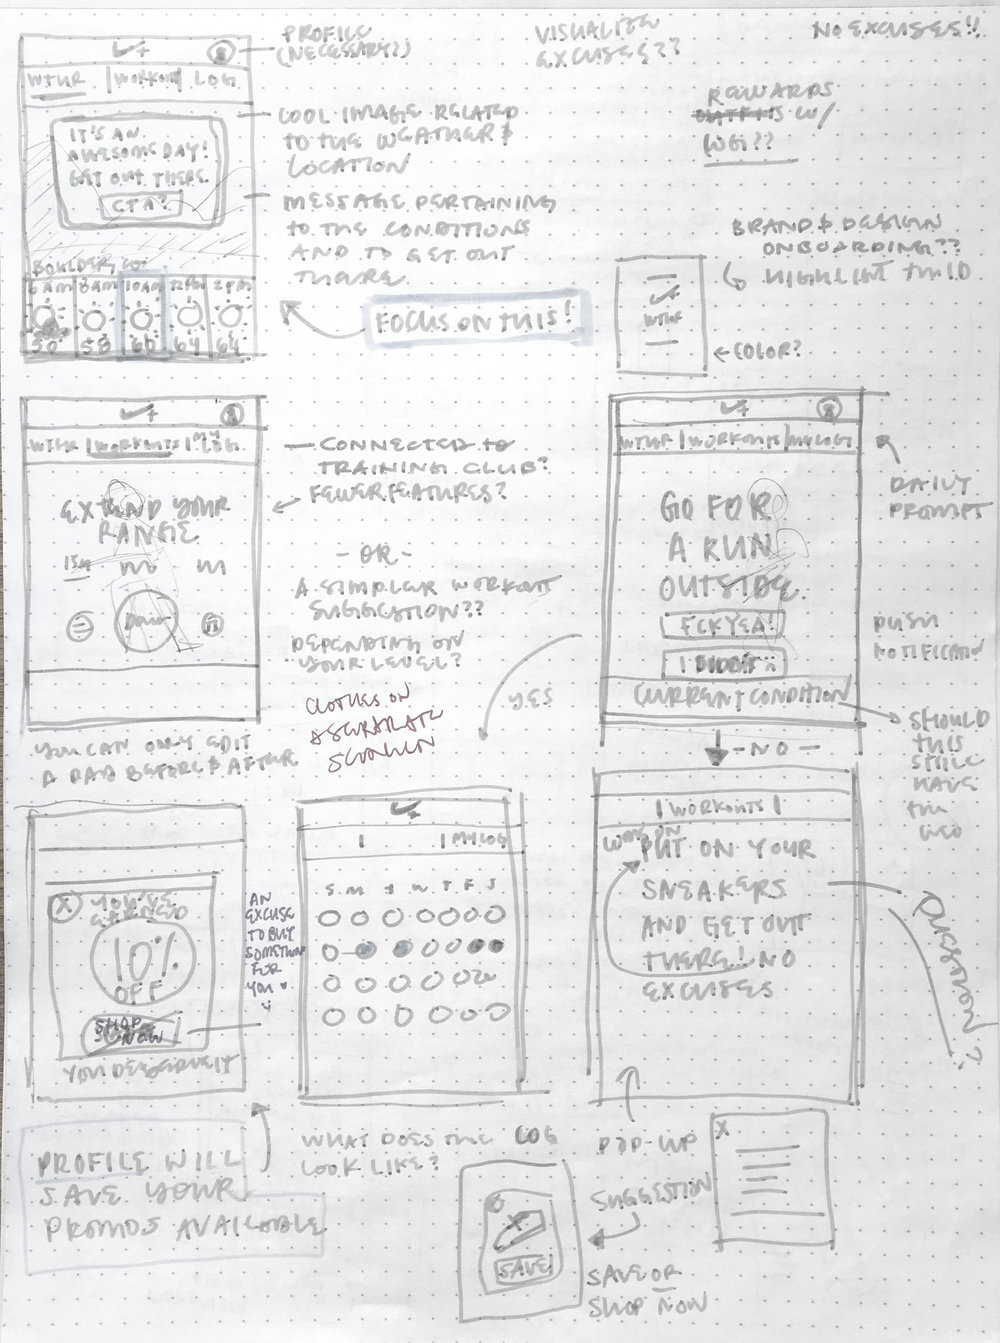 nike-sketches-2.jpg